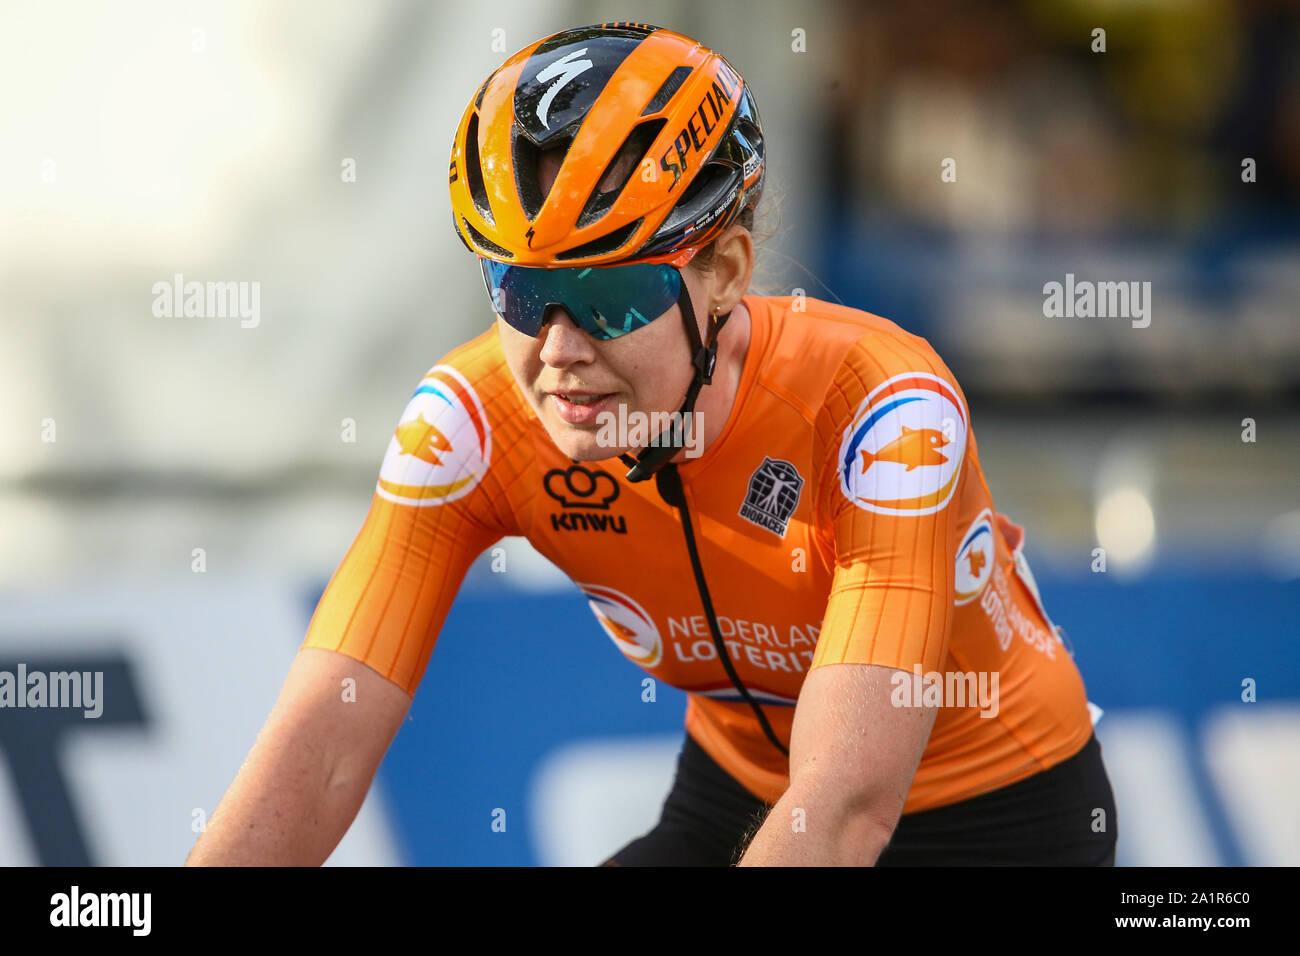 Harrogate, UK. 28th Sep, 2019. Anna Van Der Breggen of the Netherlands takes Silver in the 2019 UCI Road World Championships Womens Elite Road Race. September 28, 2019 Credit Dan-Cooke/Alamy Live News Stock Photo